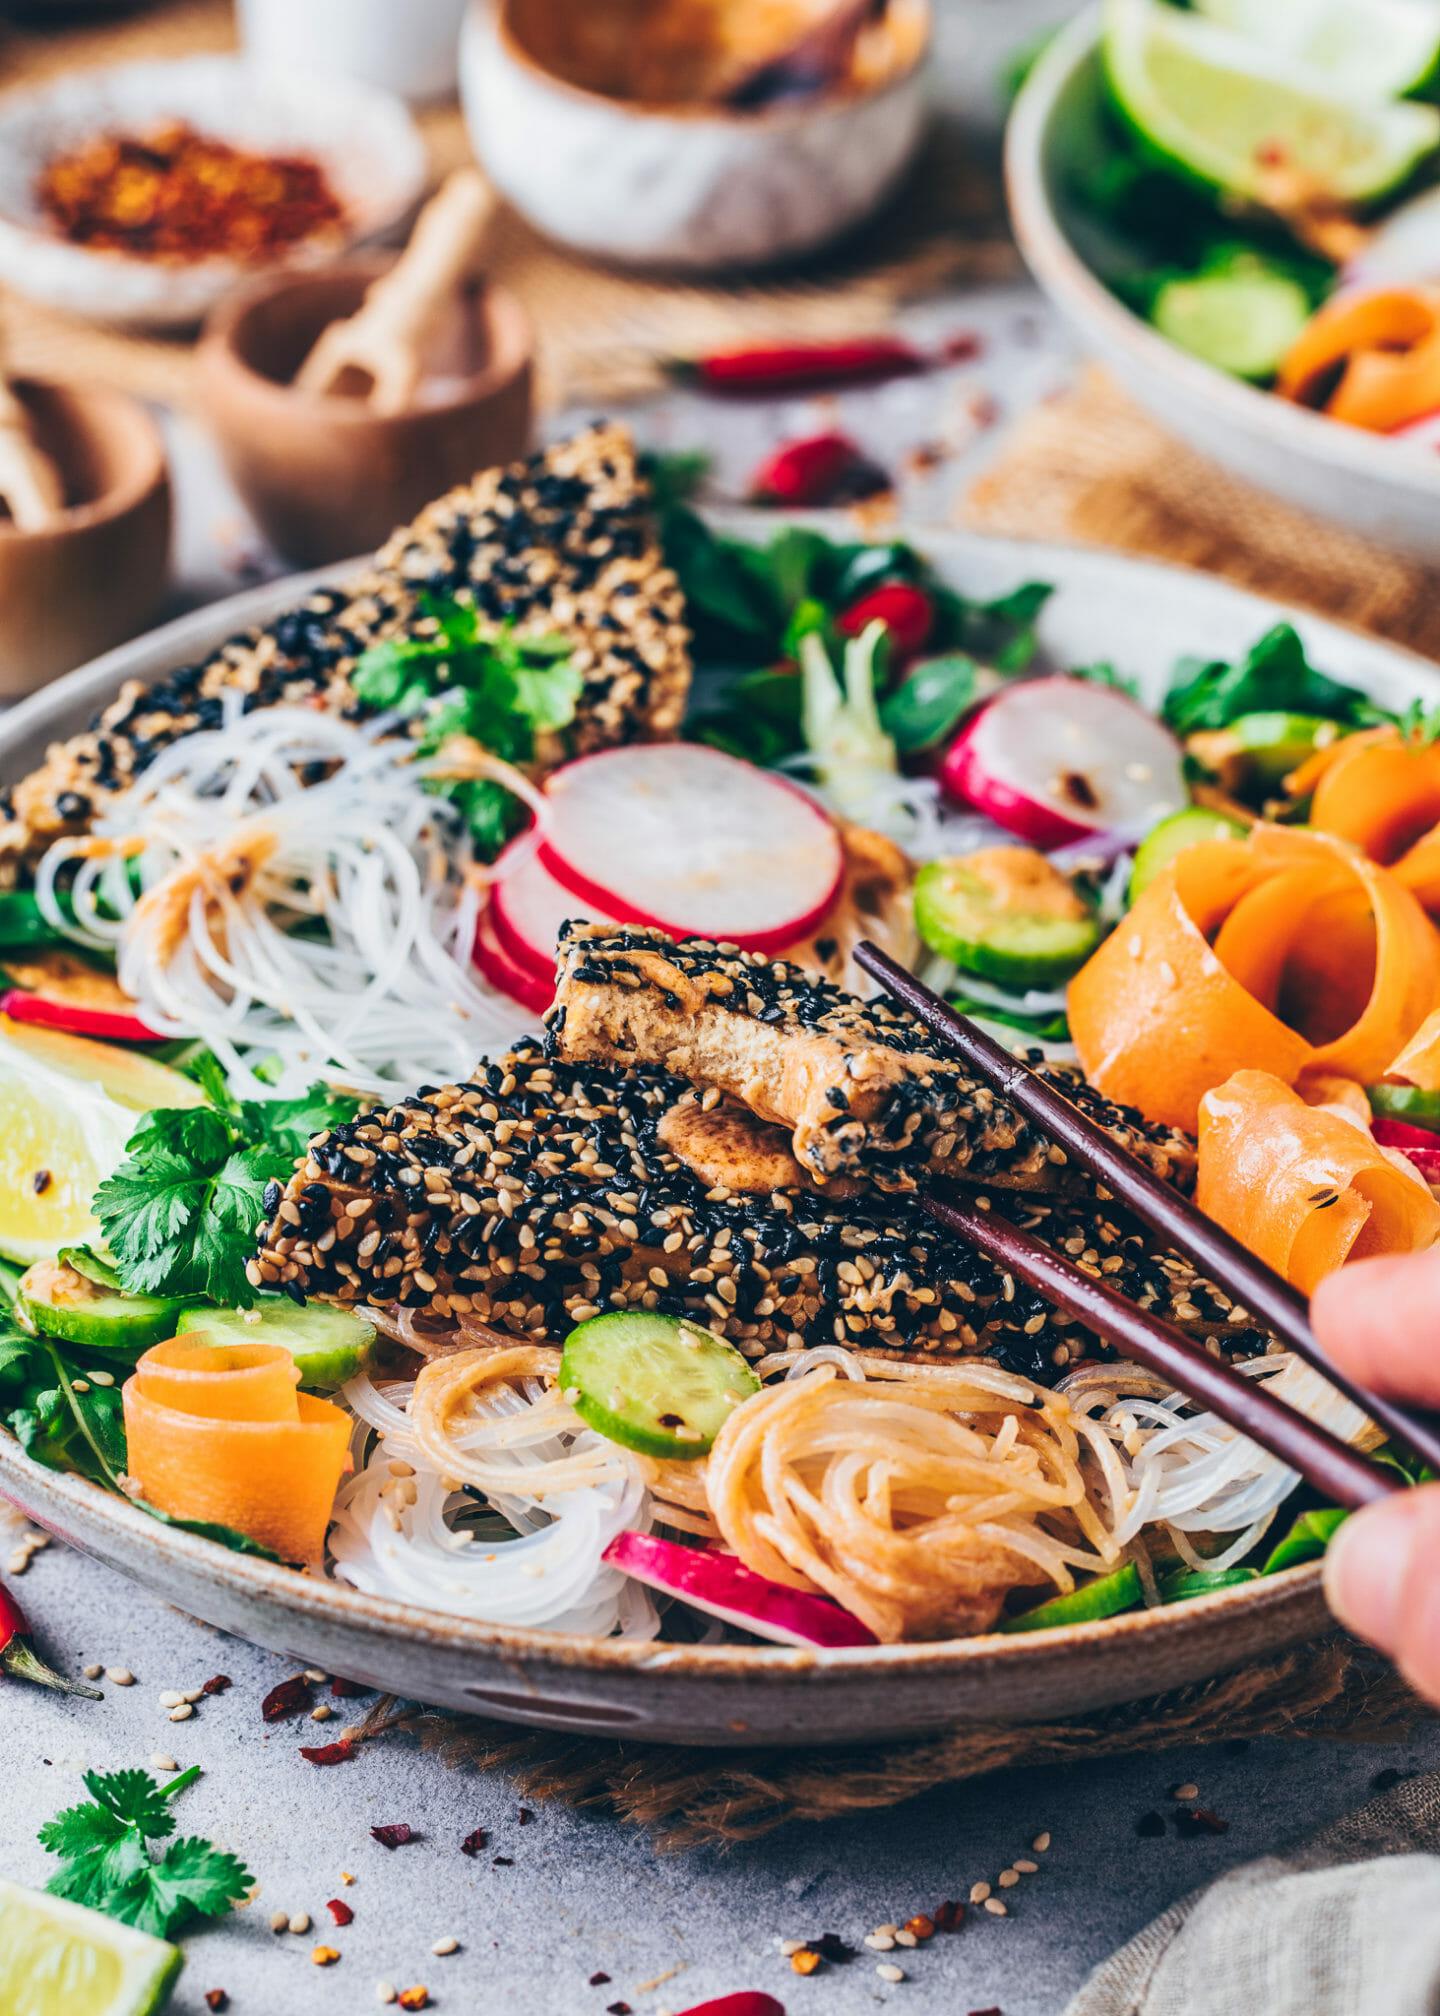 Rice Noodle Salad with crispy Sesame Tofu, carrots, radishes, lettuce, lemon, chili and peanut sauce dressing